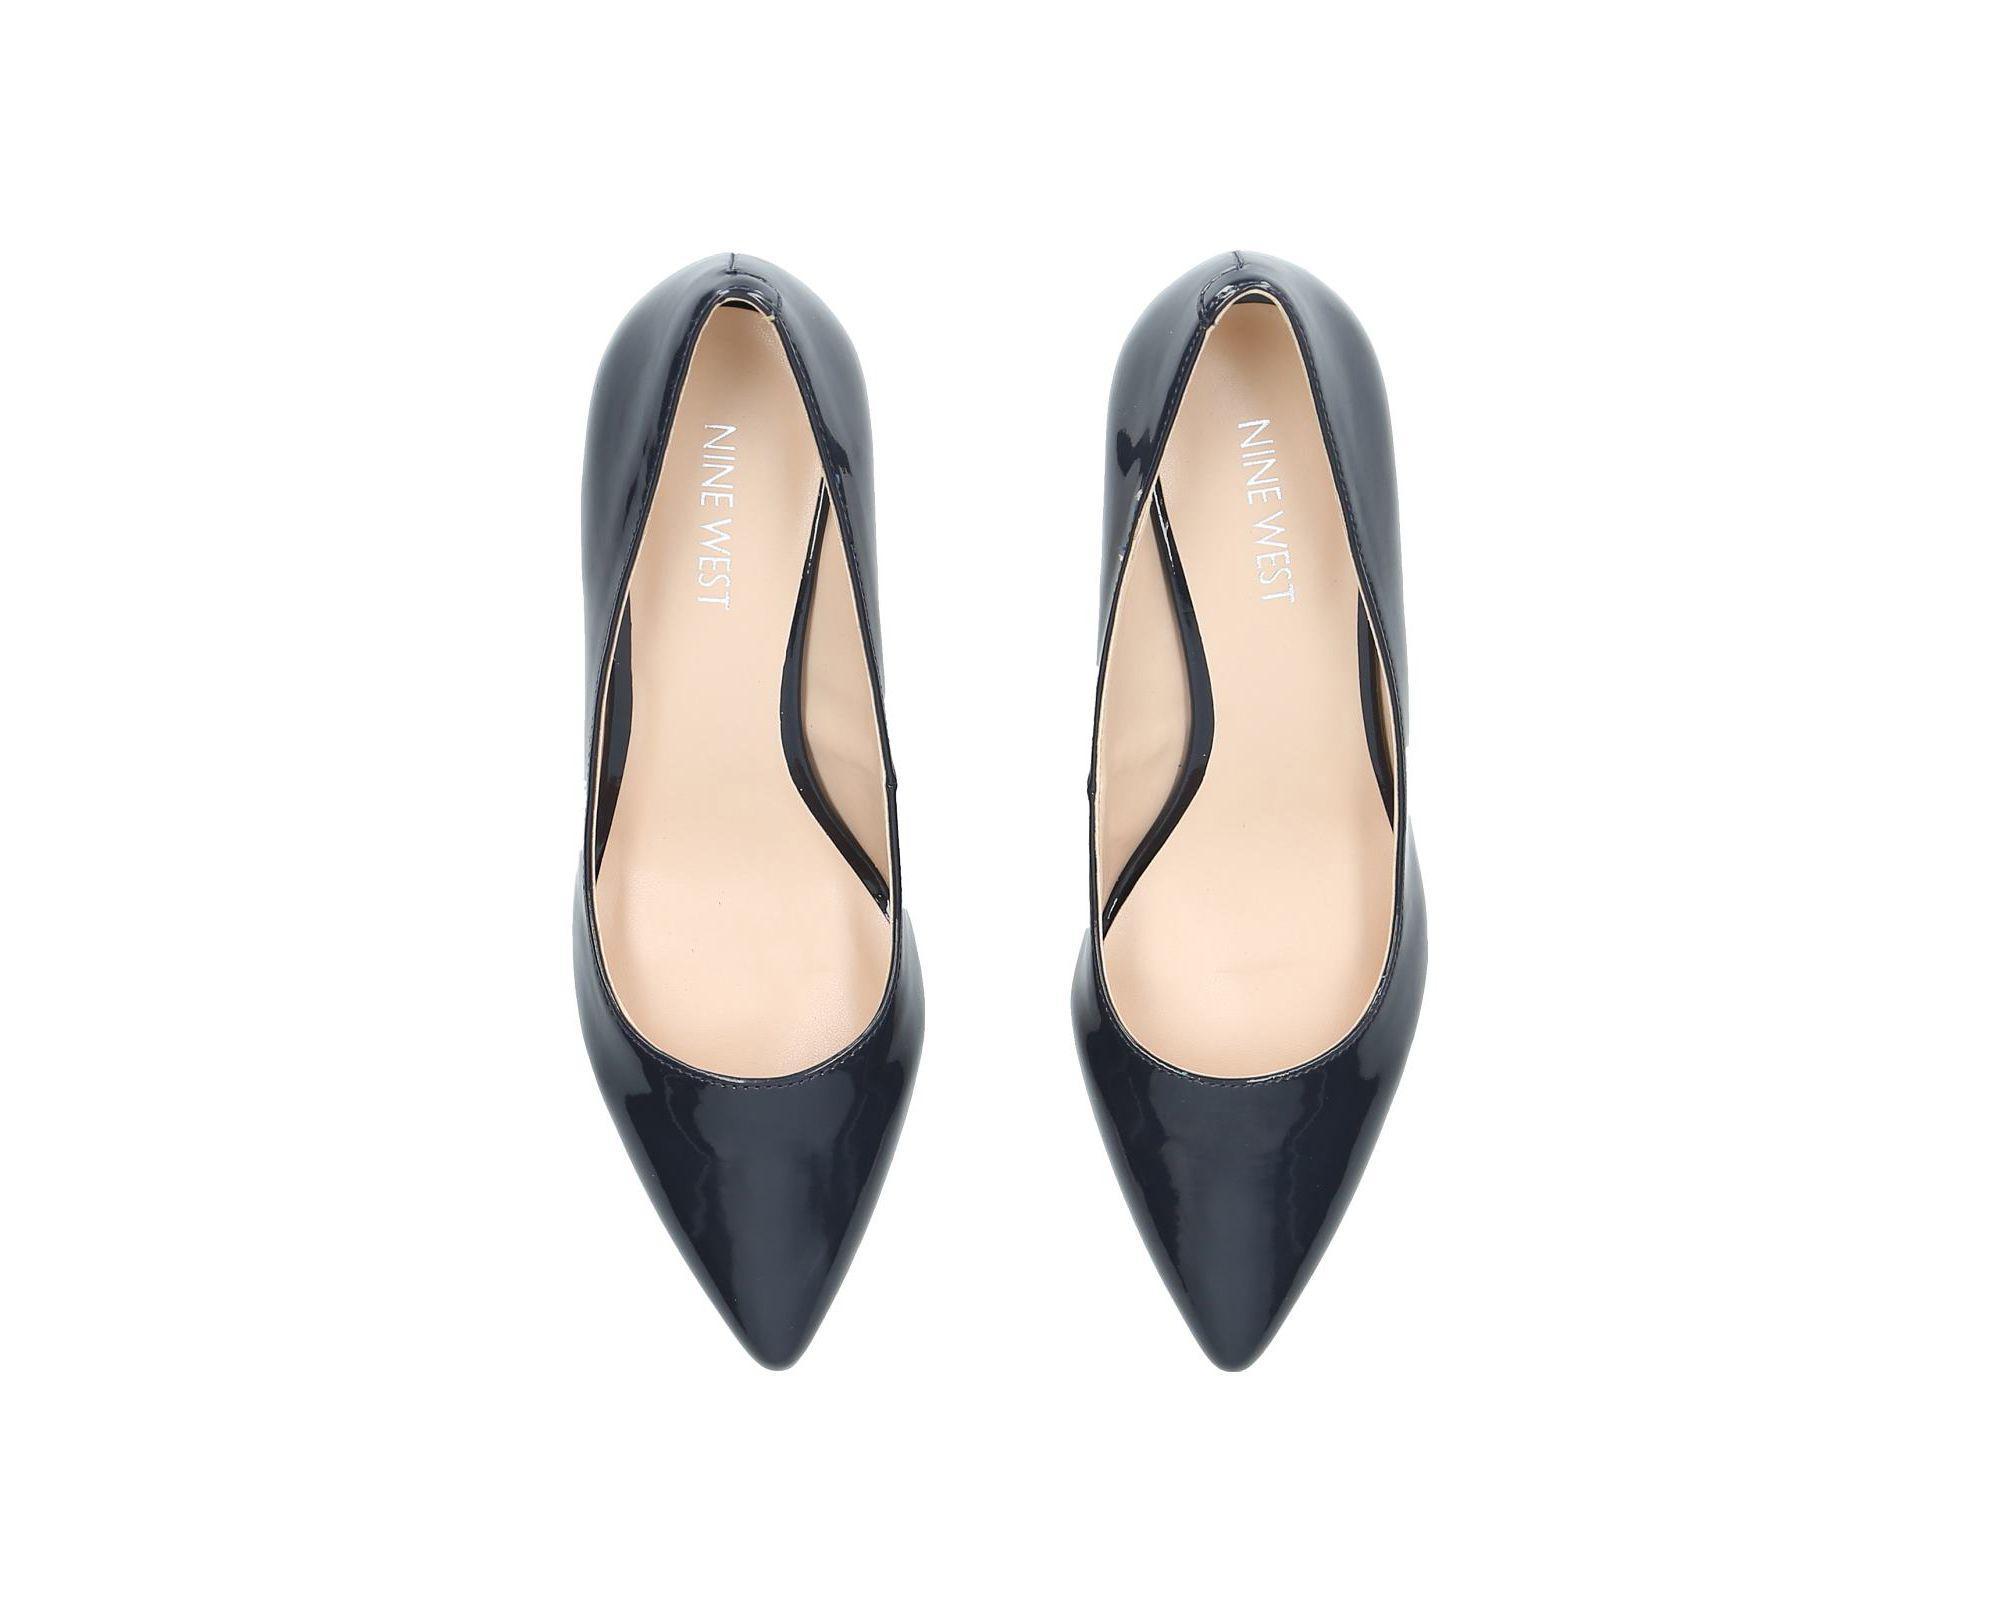 6f5638b4748 Nine West - Blue Navy  flagship 55  Patent Court Shoes - Lyst. View  fullscreen